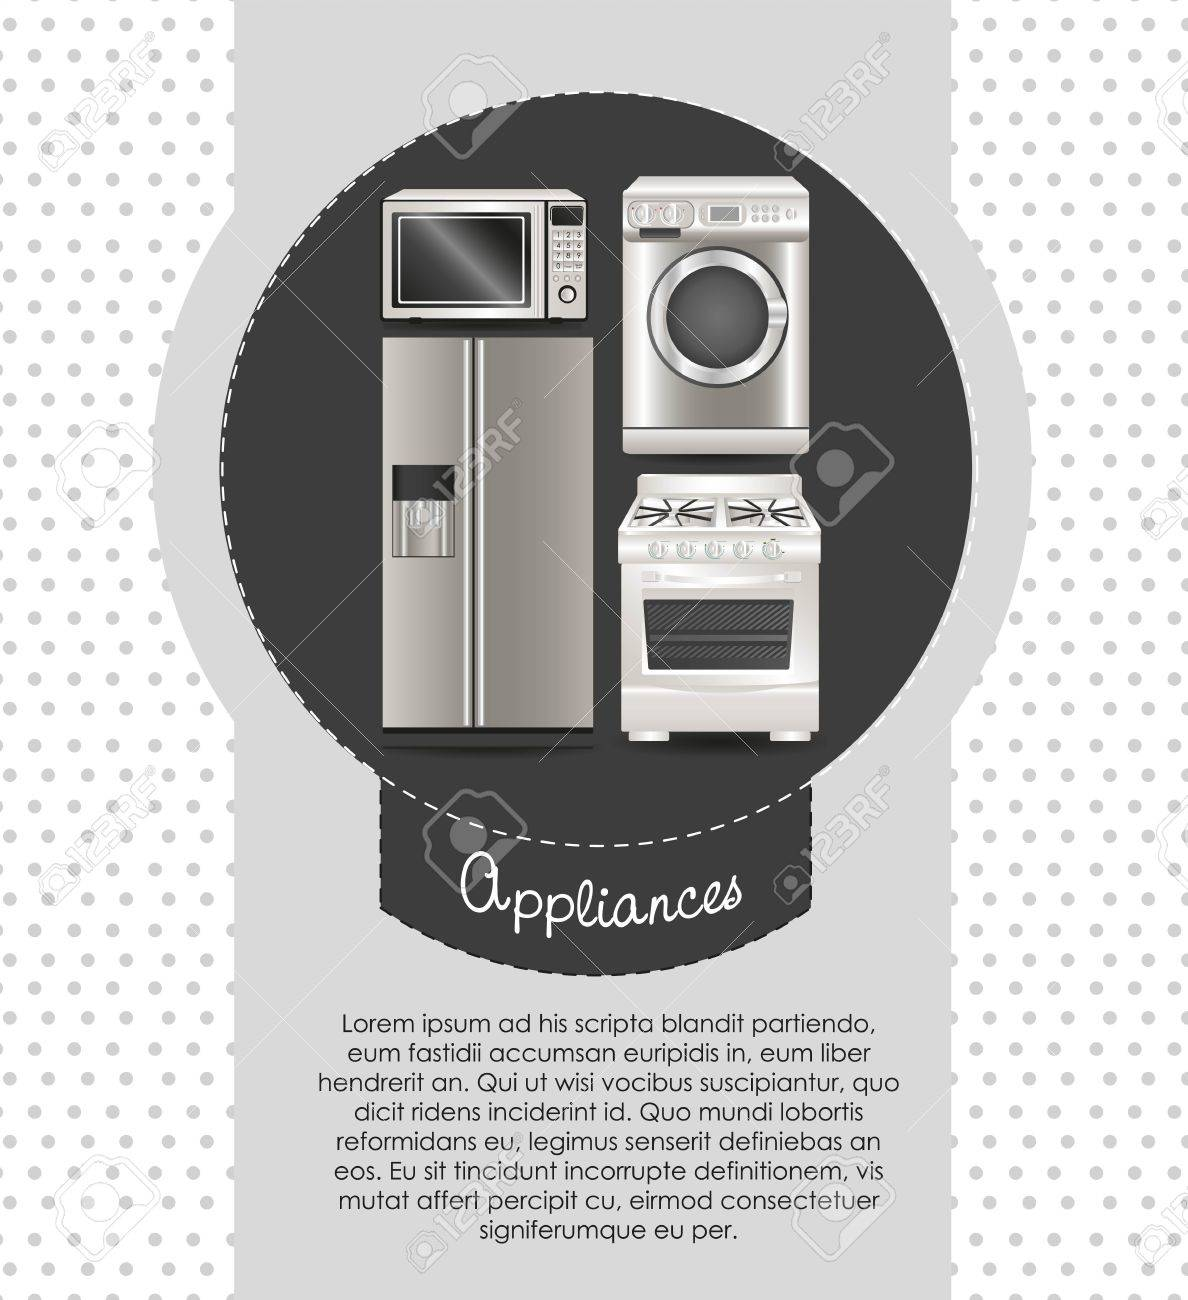 Appliances Discount Flyer Discount Appliances Contains Washing Machine Stove